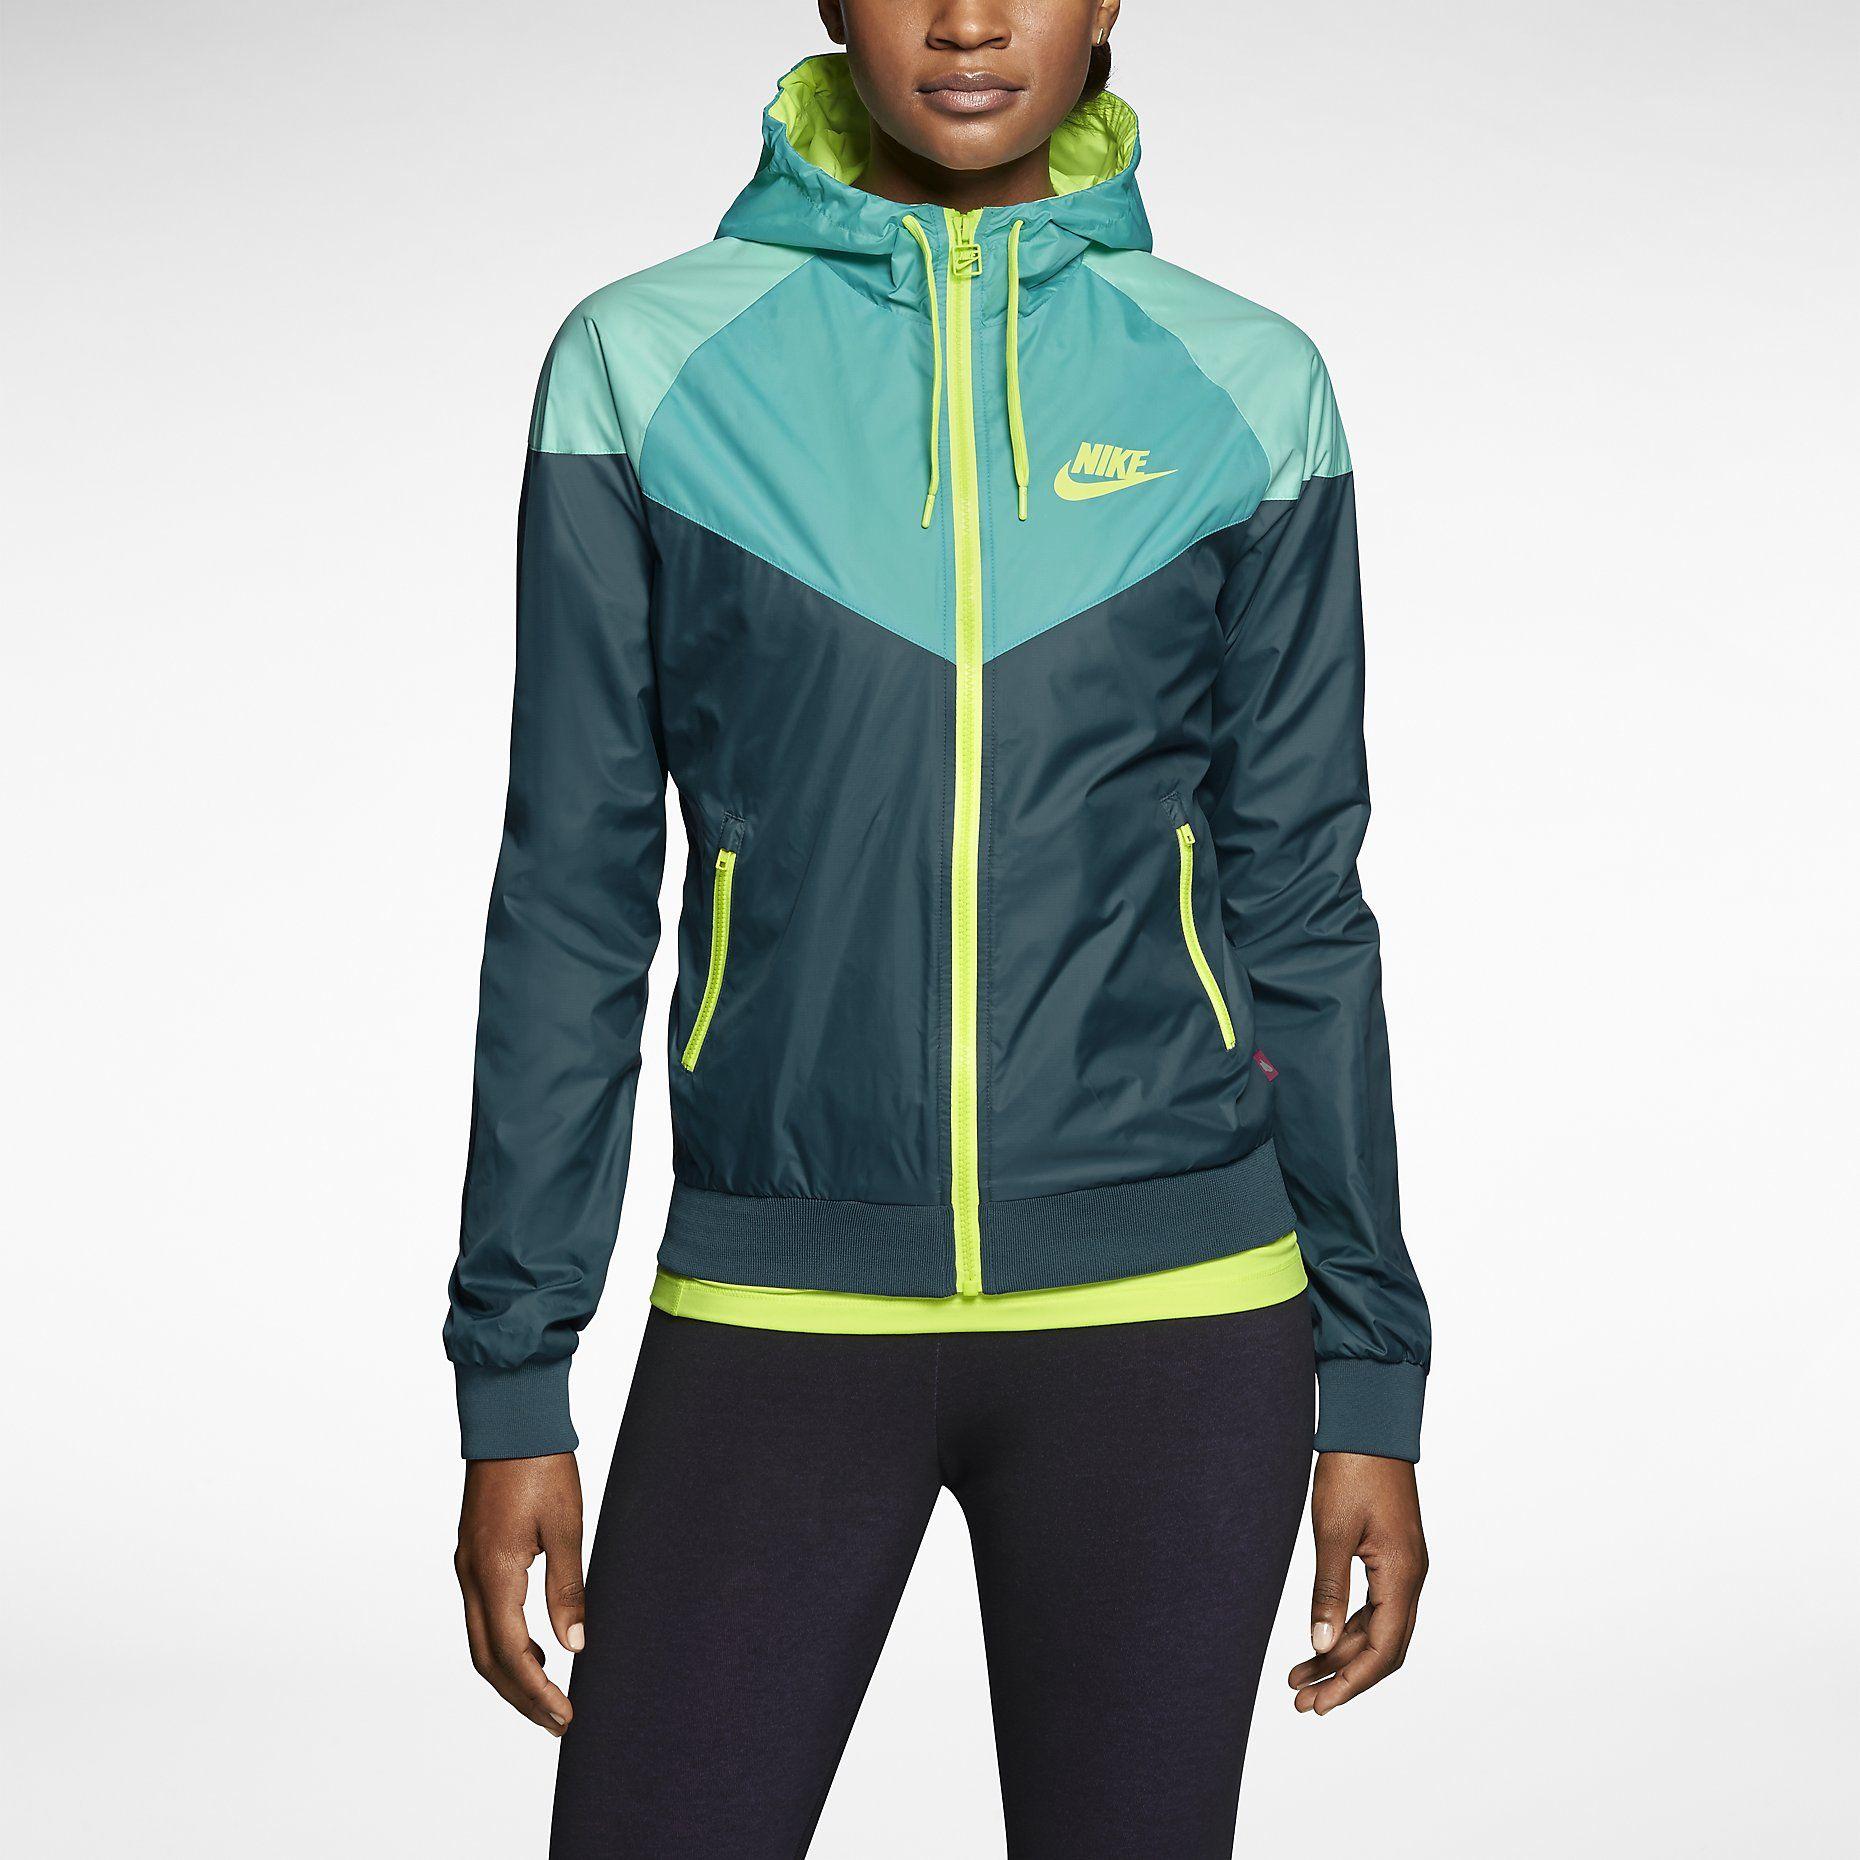 c04254926 Nike Windrunner Women's Jacket. Nike Store | silhouette F14 | Nike ...